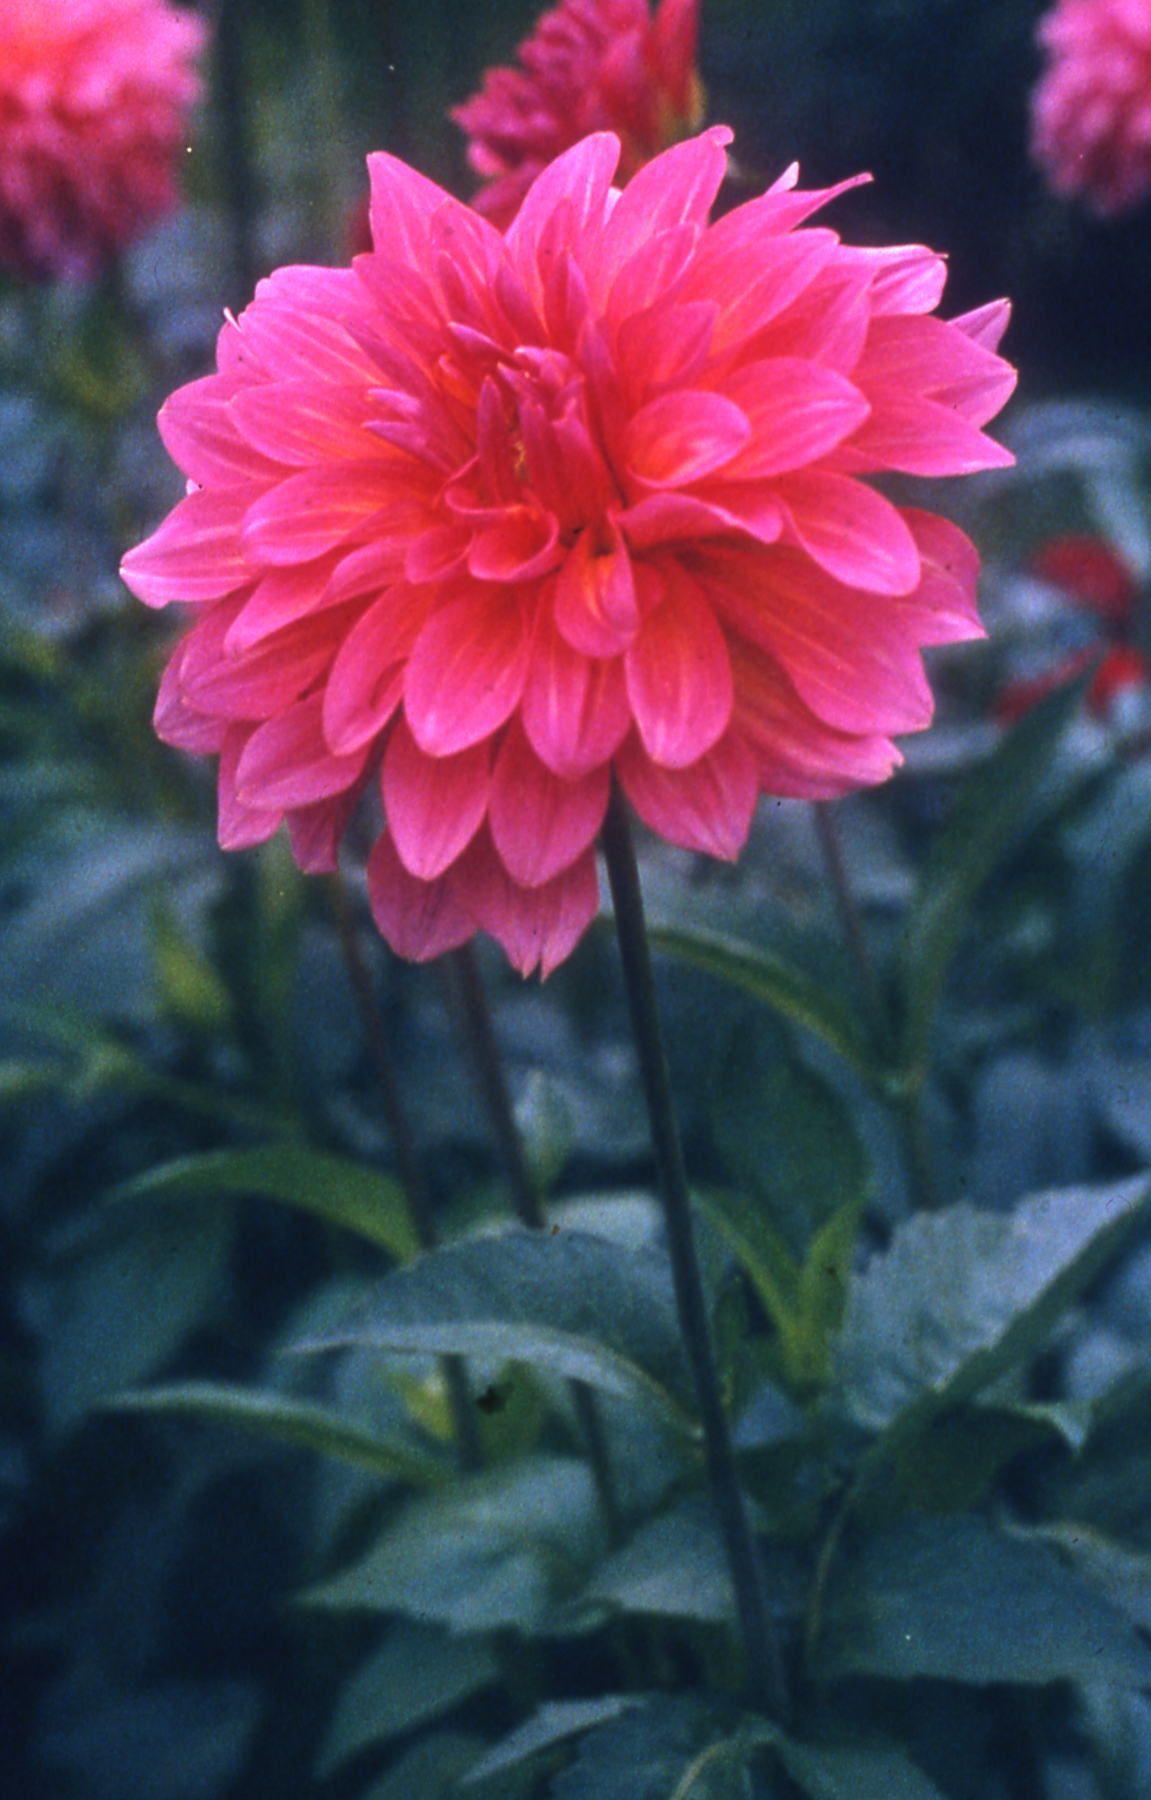 Fiori Gialli Normandia.Dahlia Normandy Delight Dahlias Garden Dahlia Flowers